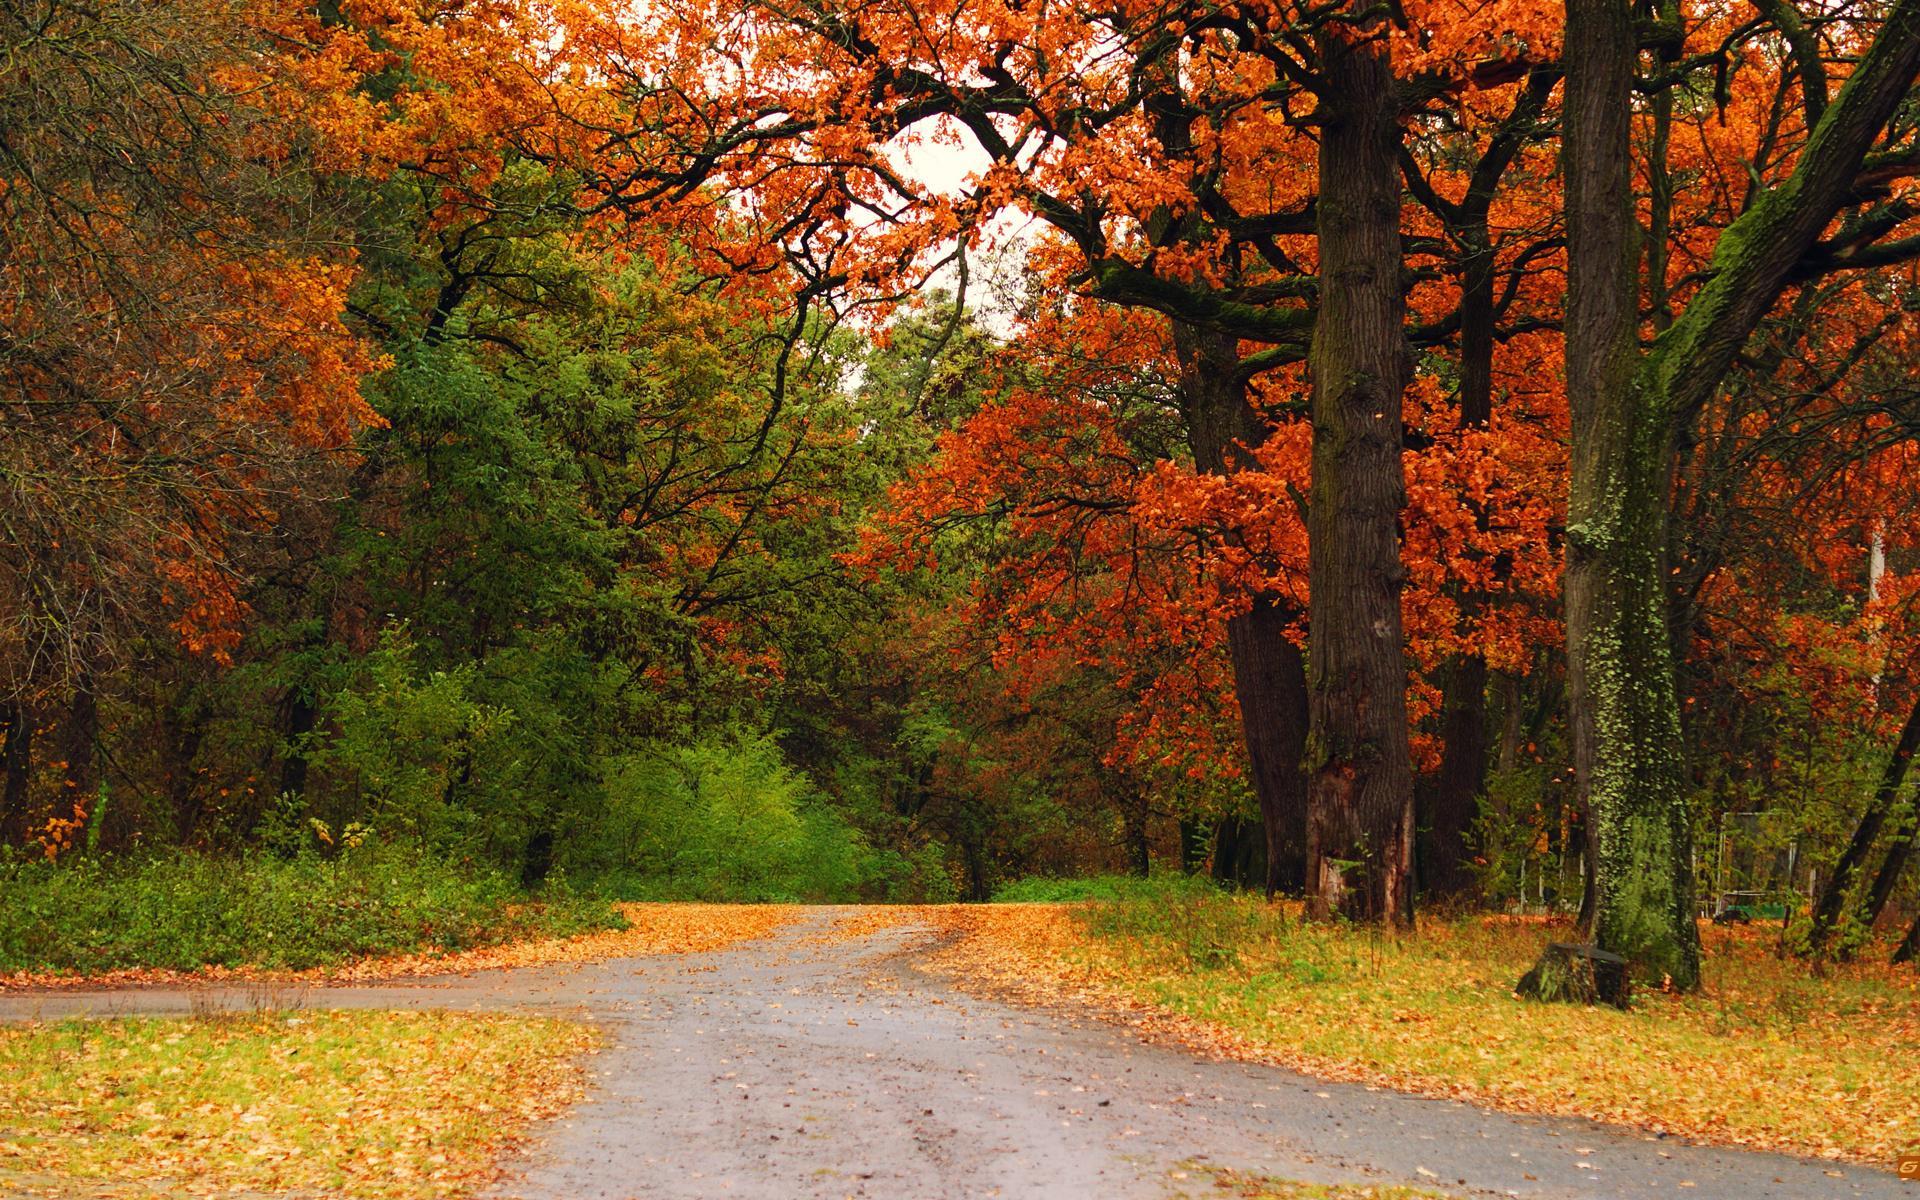 Fall Harvest Wallpaper Backgrounds Paisajes De Oto 241 O Para Fondos De Pantalla Oto 241 O Wallpapers